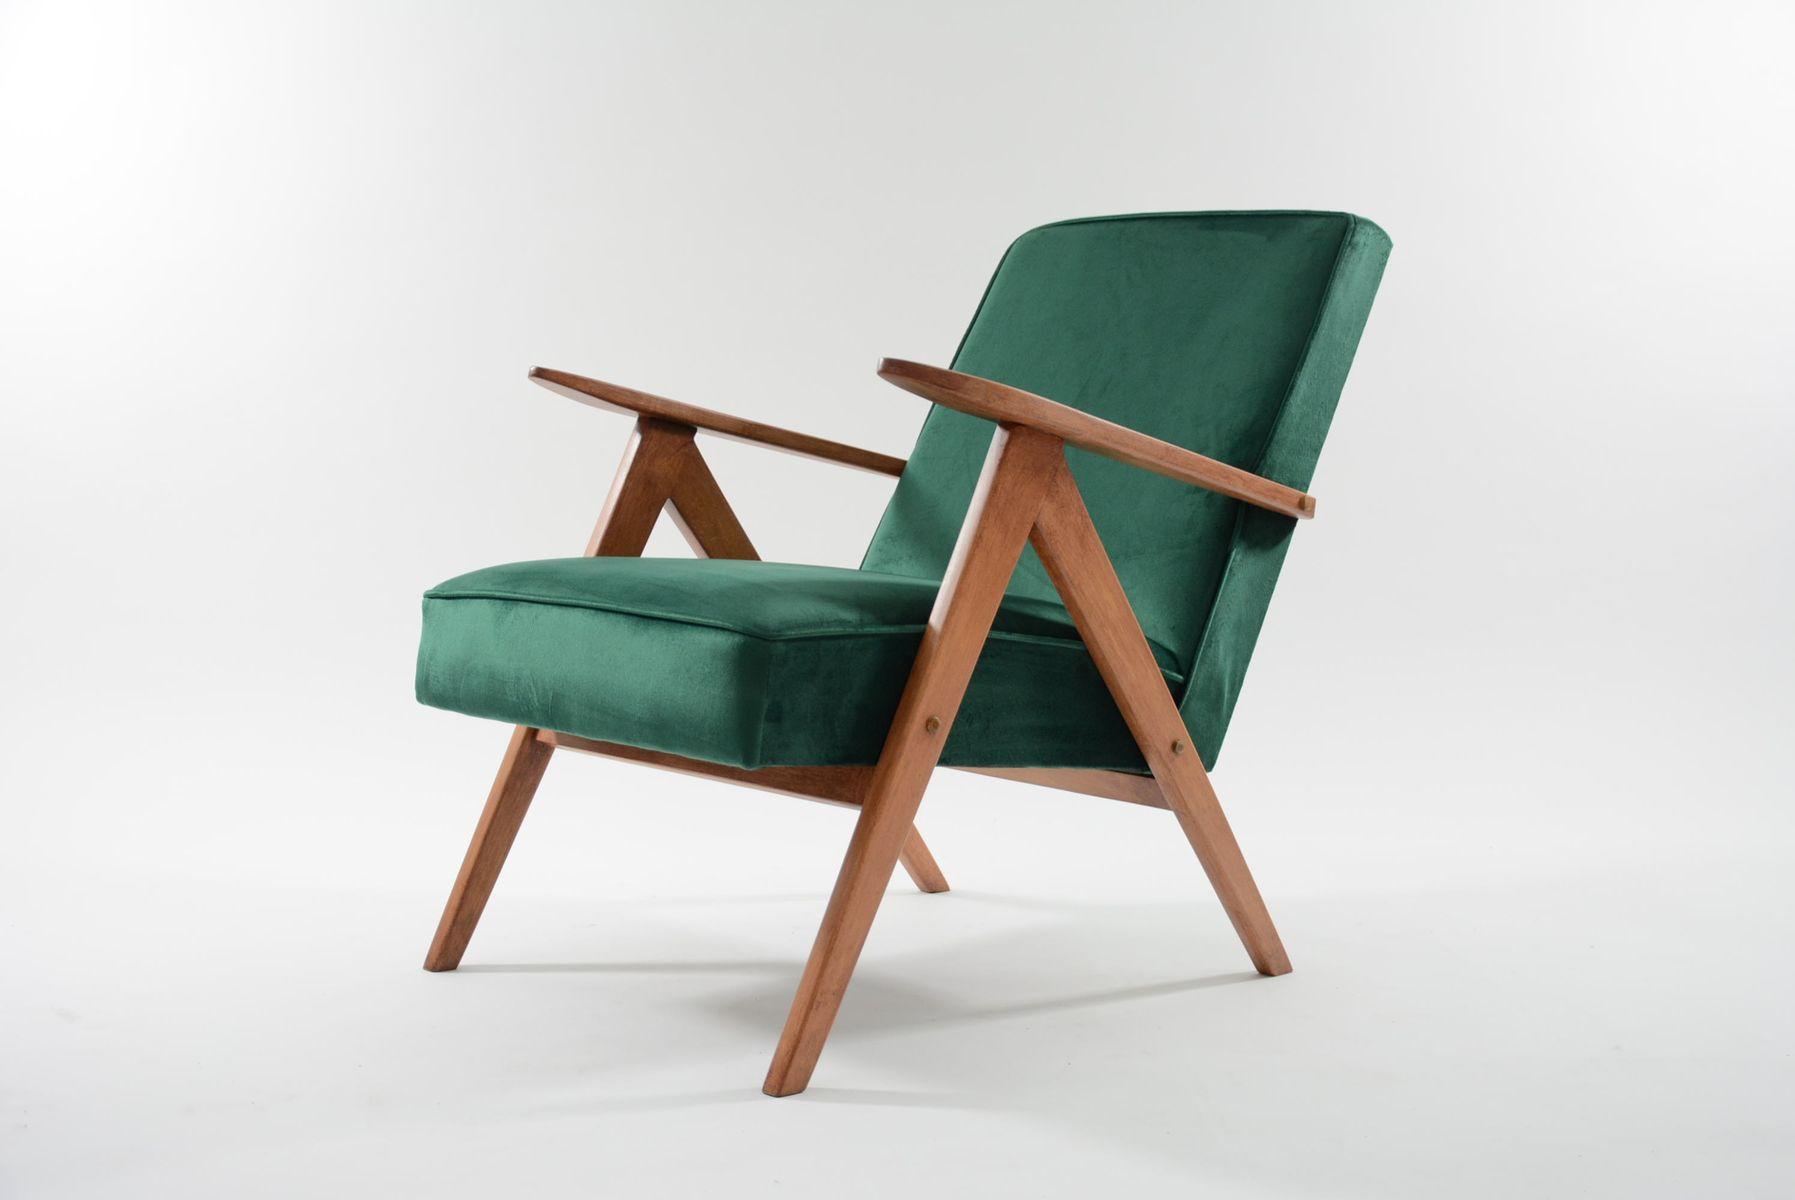 po ng sesselbezug ii biege grau sesselbezug po ng ii. Black Bedroom Furniture Sets. Home Design Ideas